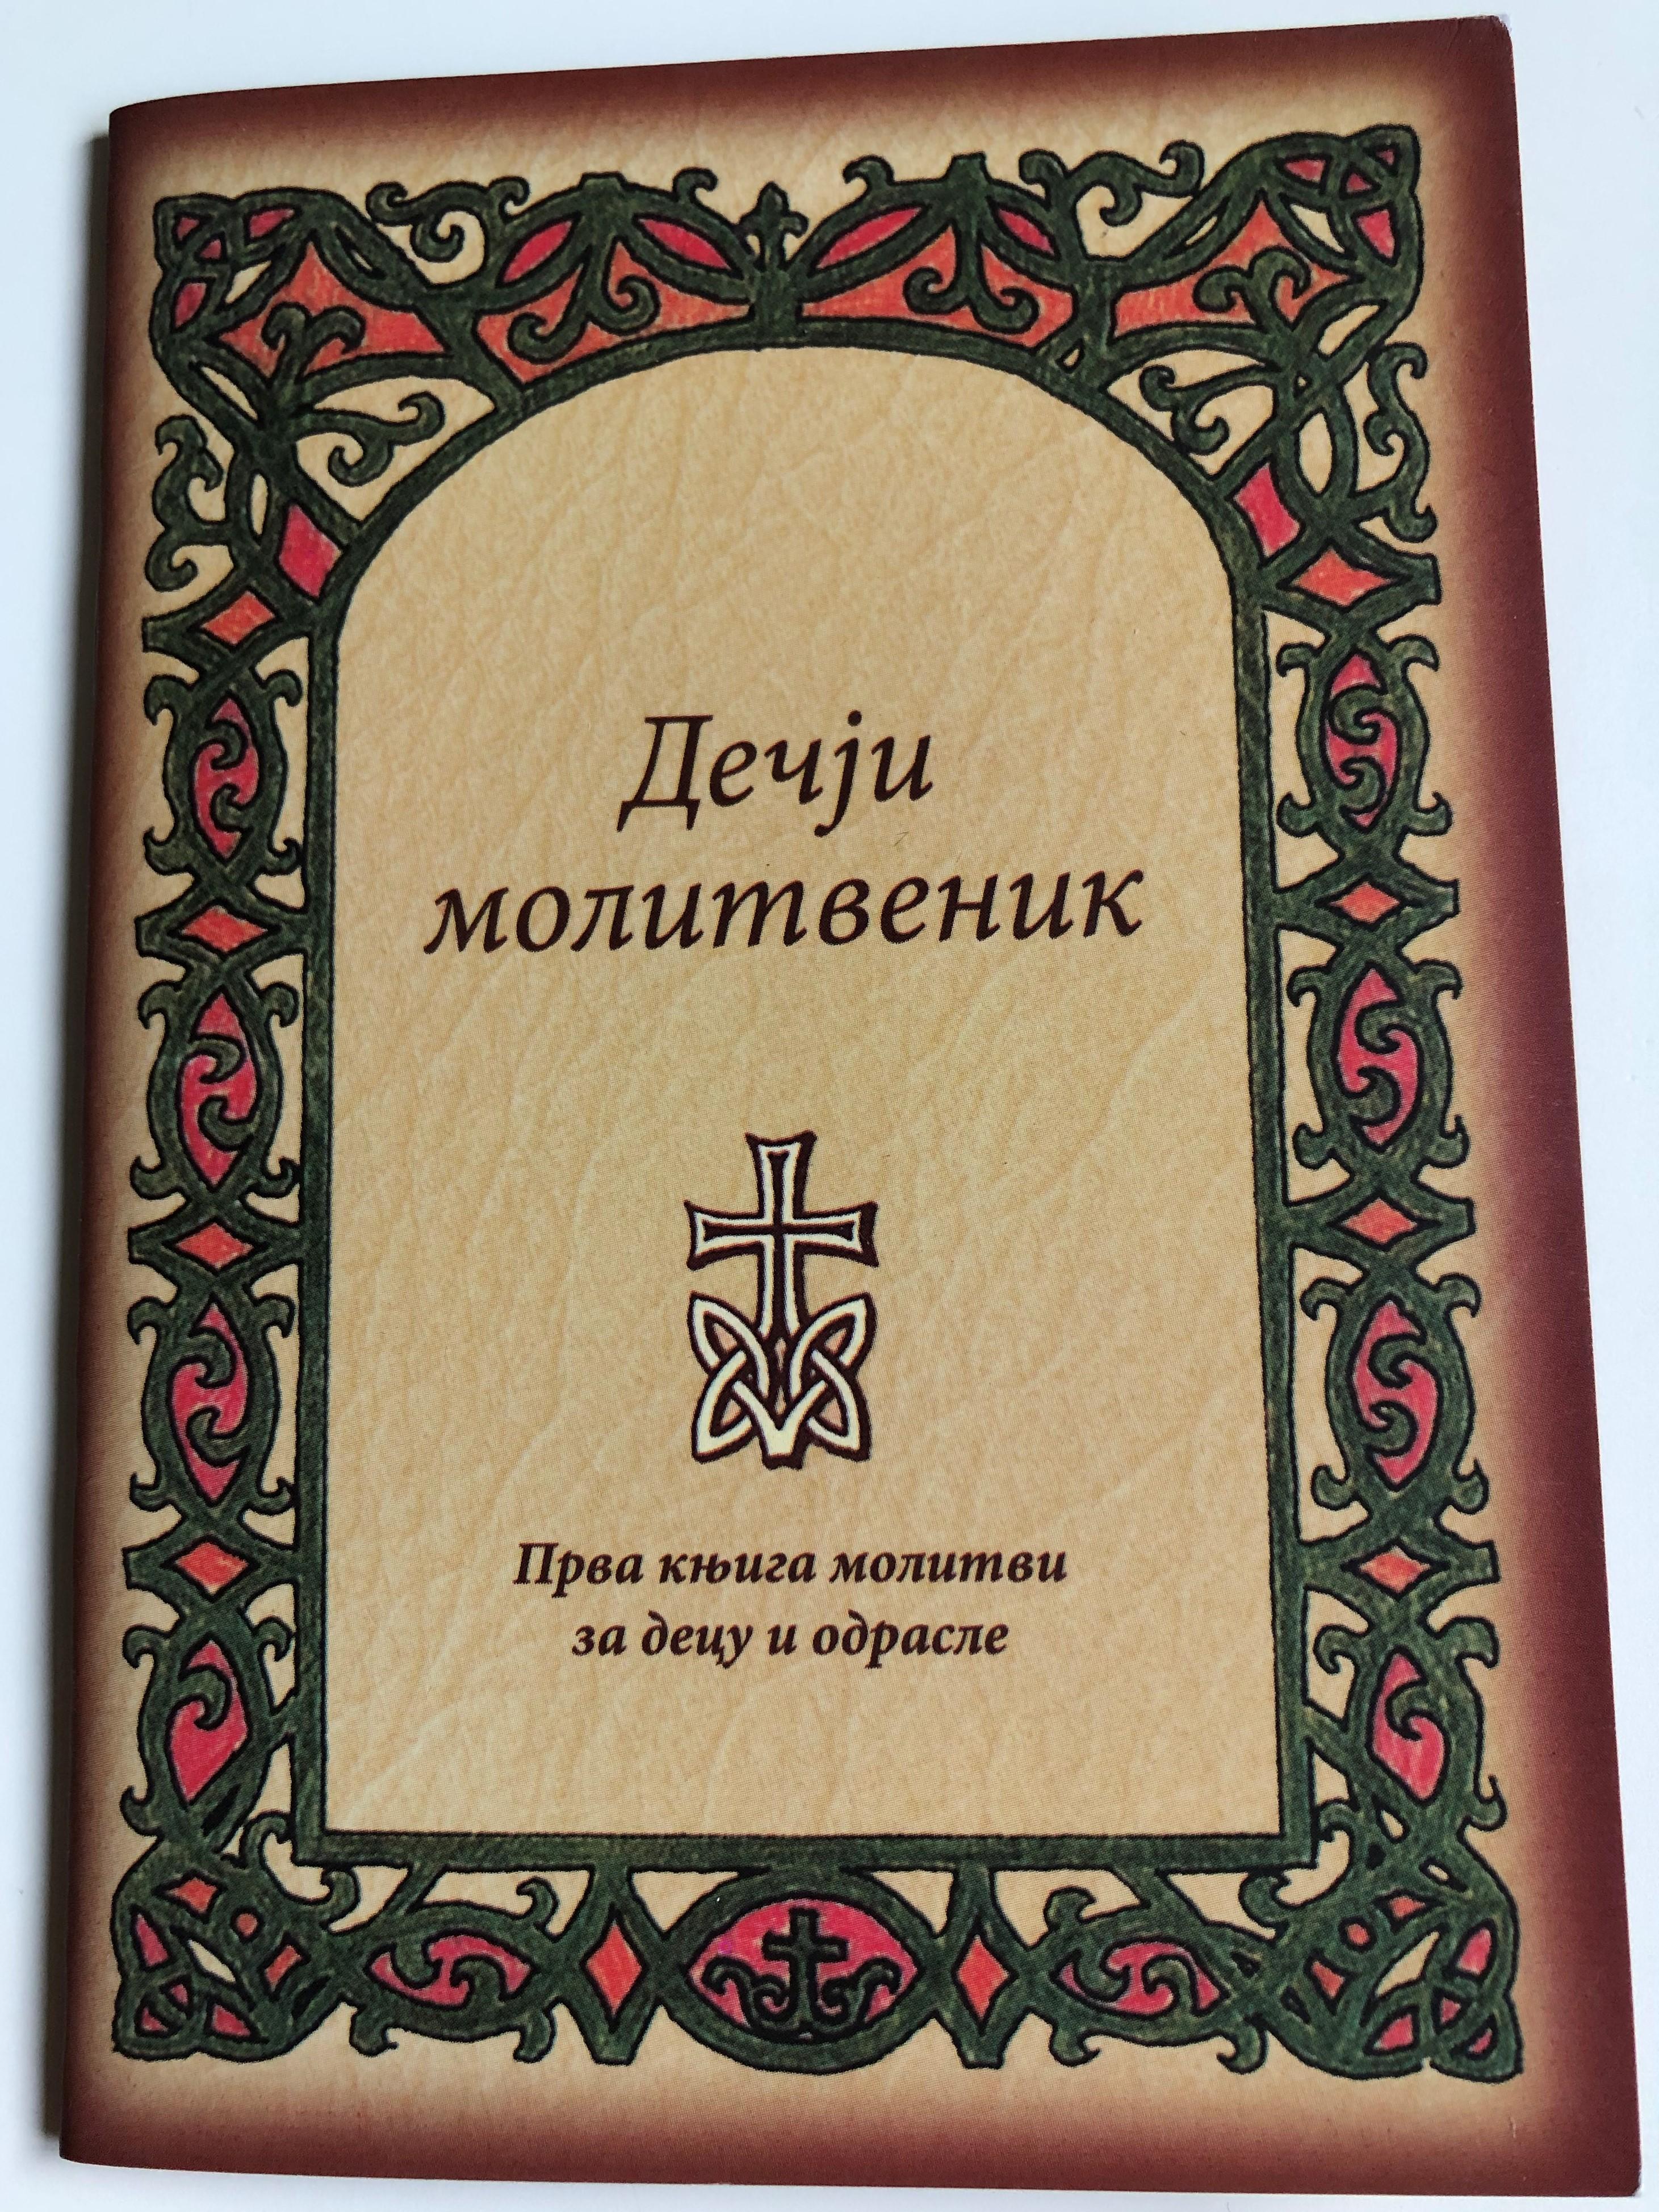 -serbian-orthodox-children-s-prayer-booklet-1.jpg